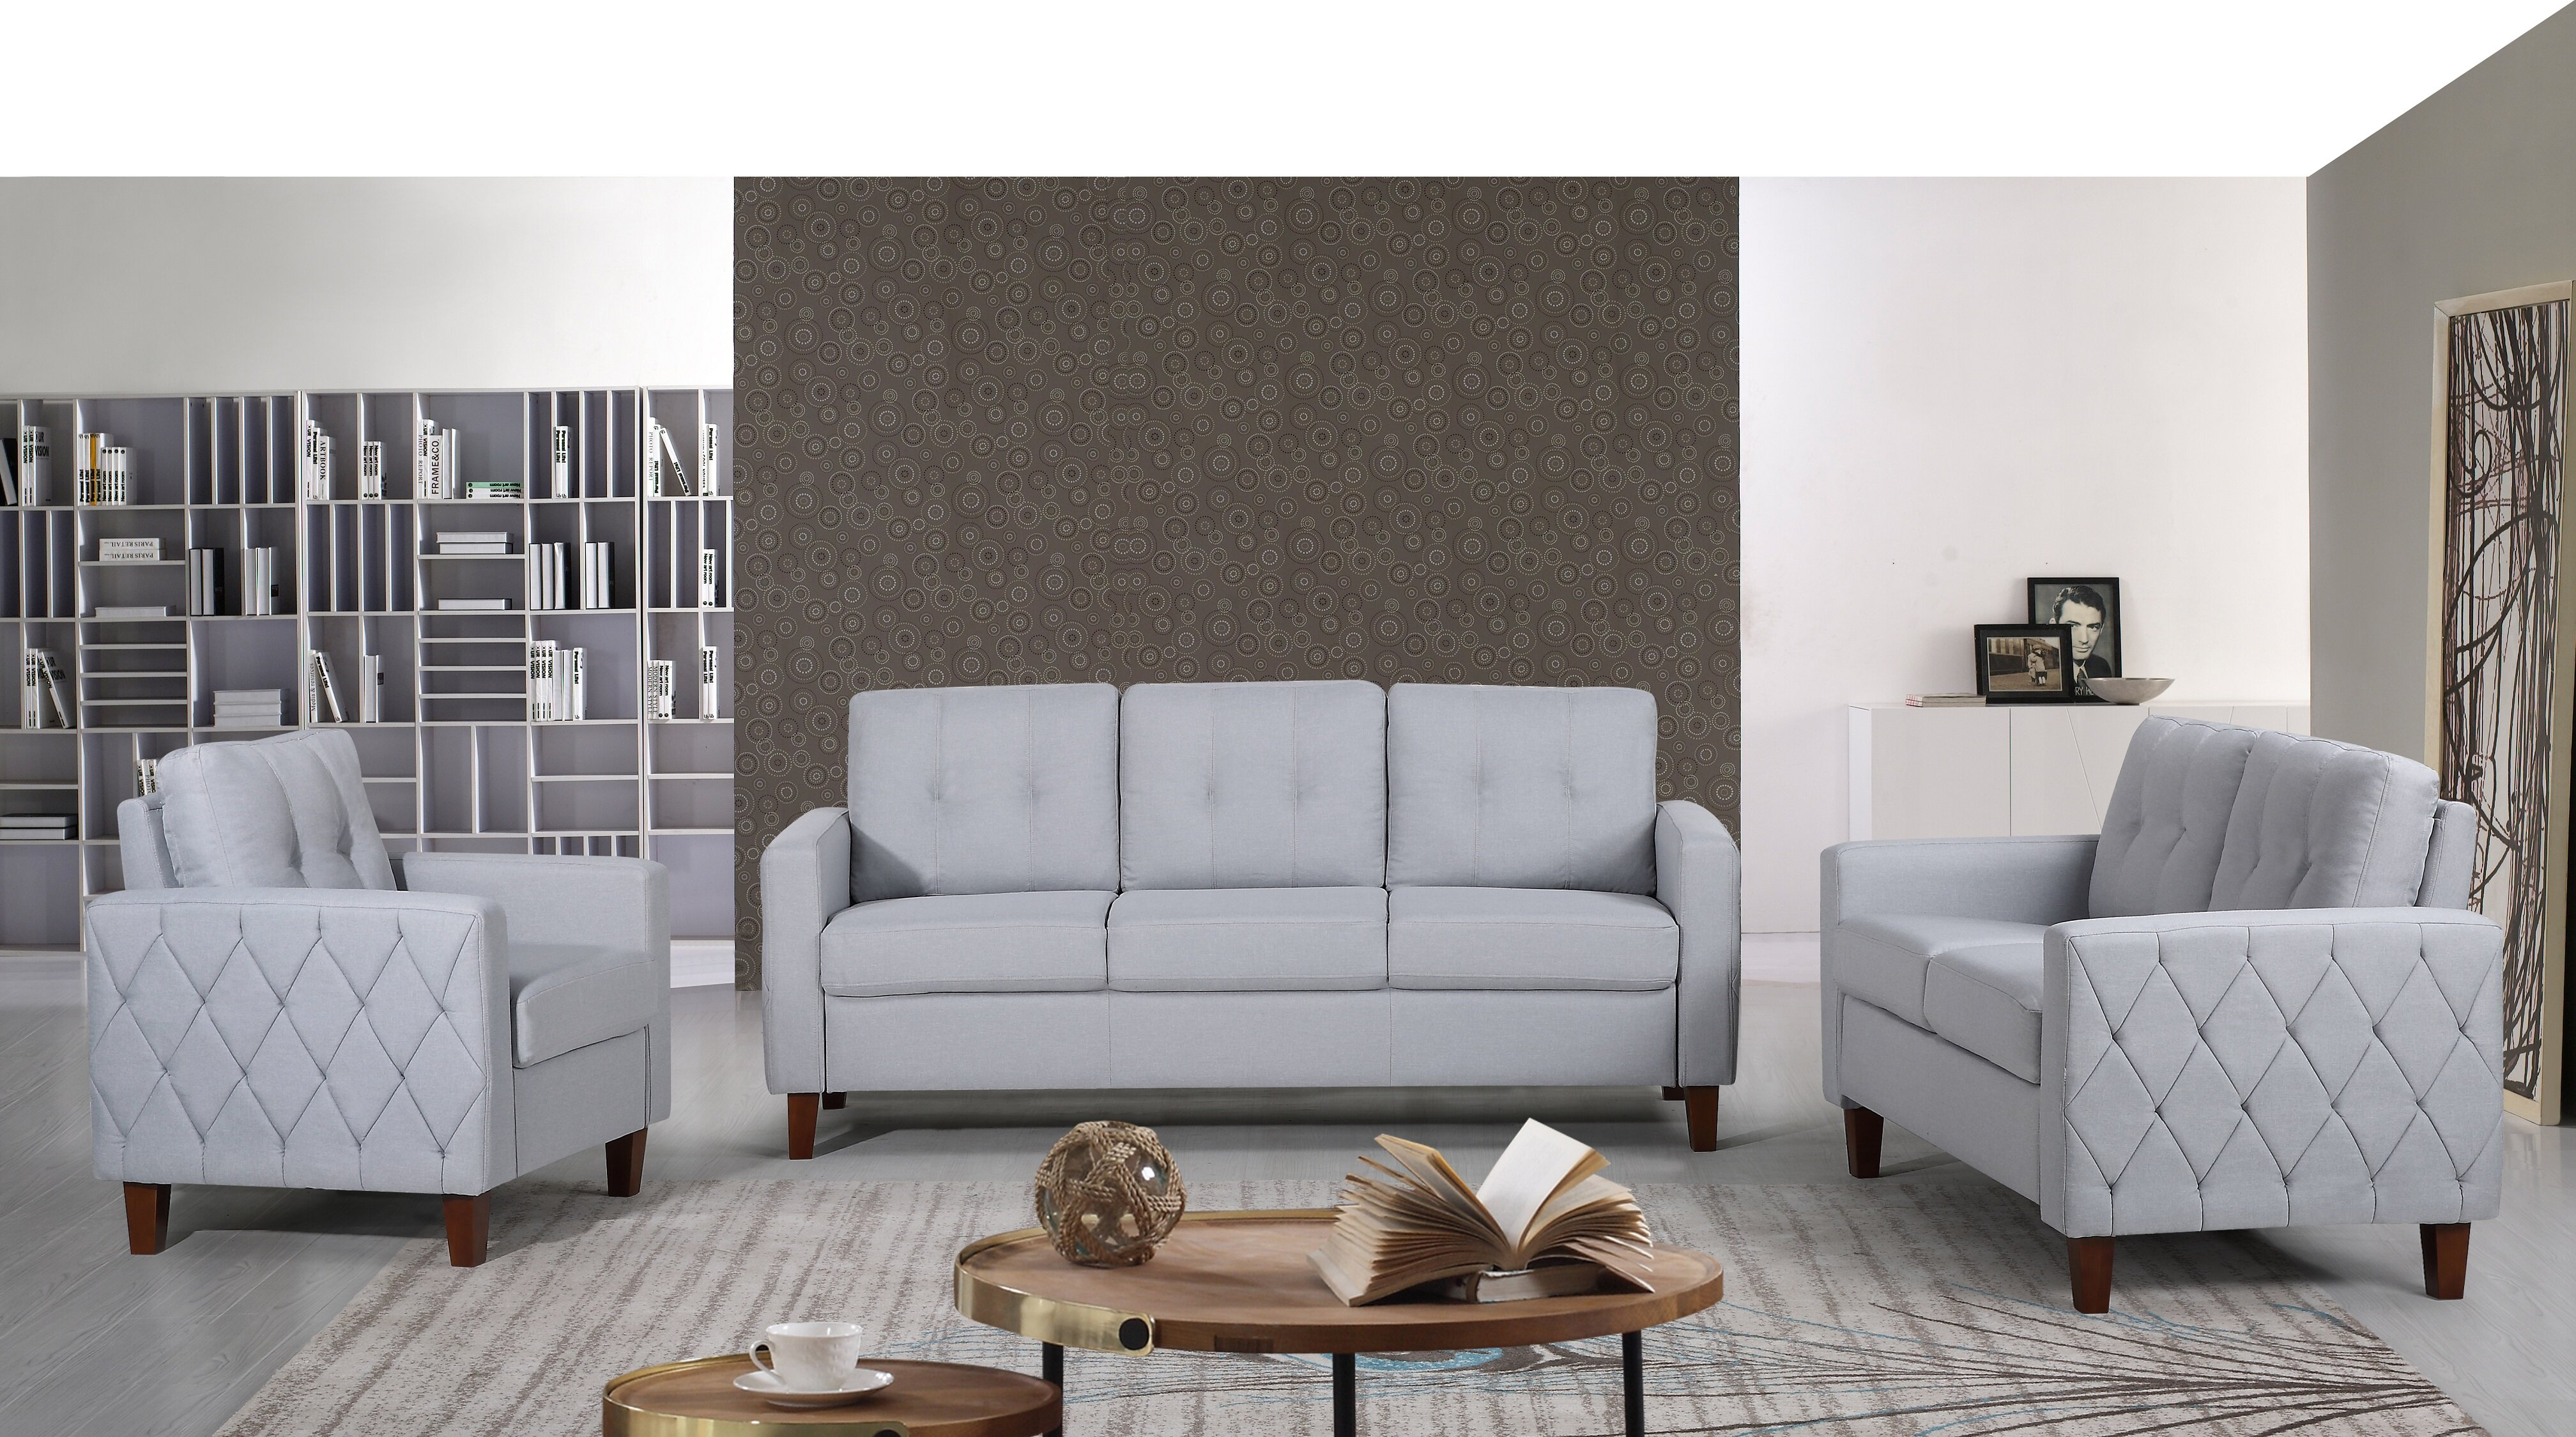 Ivy bronx harrad tufted mid century 3 piece living room set reviews wayfair